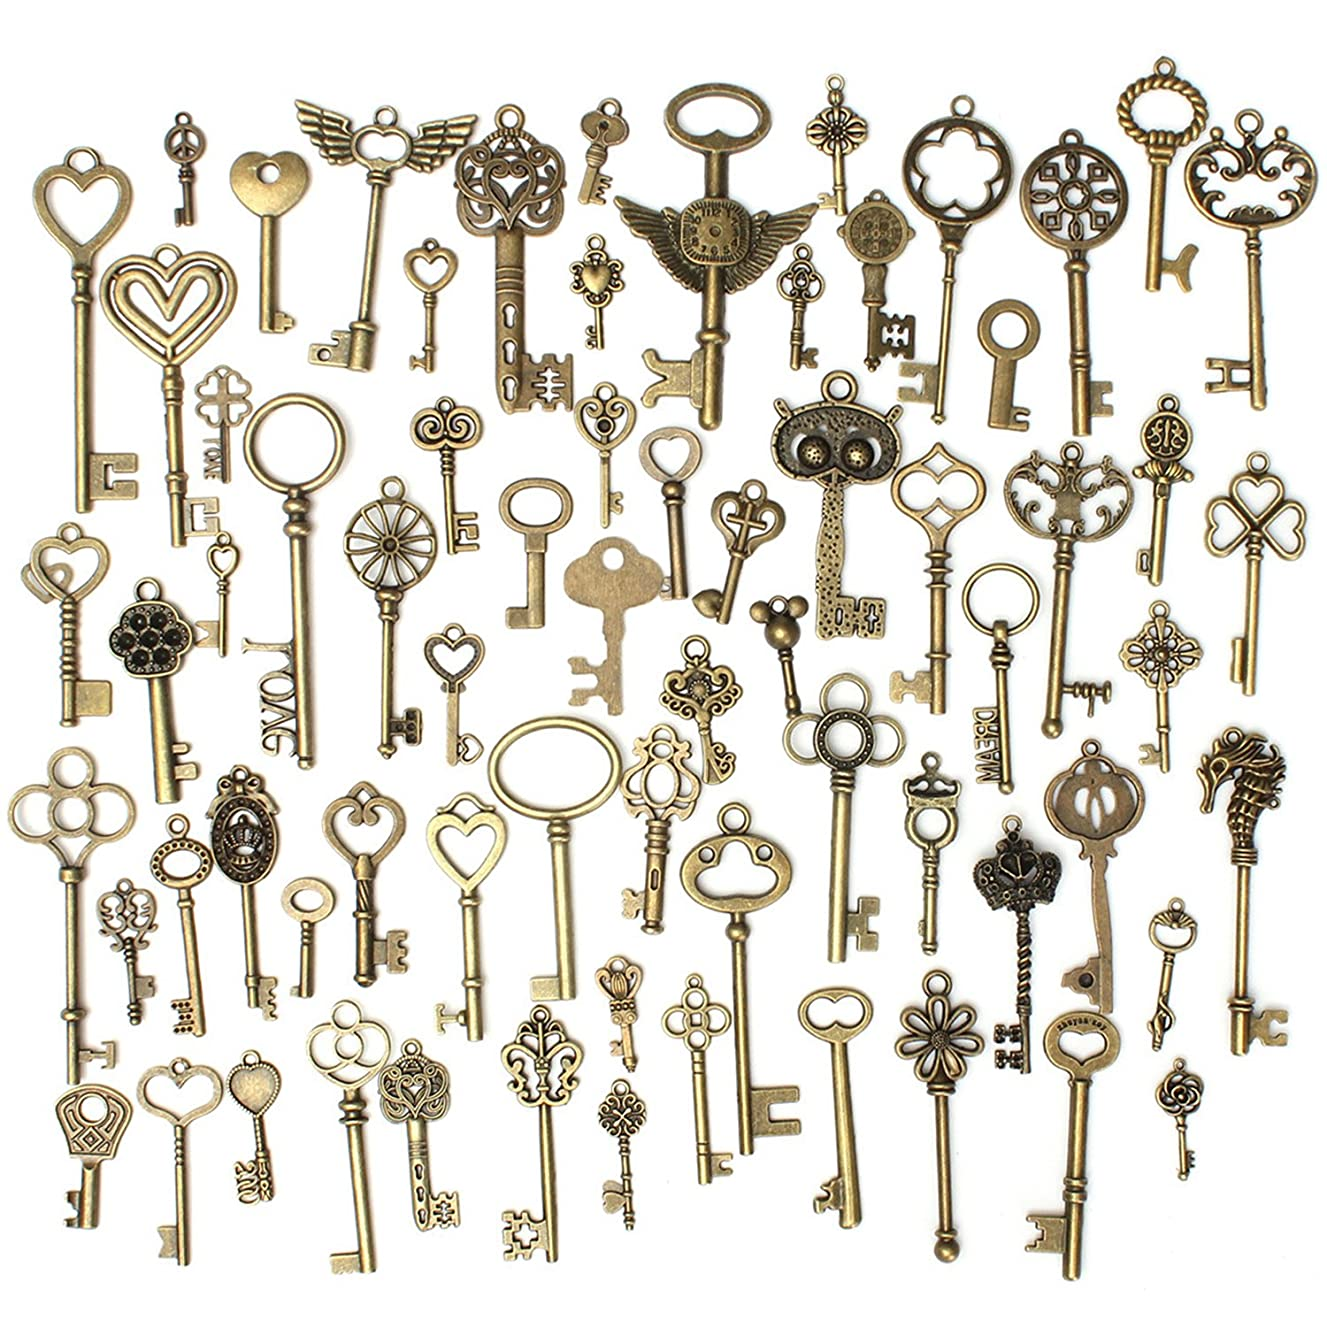 Gutapo 69pcs Skeleton Keys Charms Set Pendants Accessories for DIY Handmade Necklace Jewelry Making, Antique Bronze